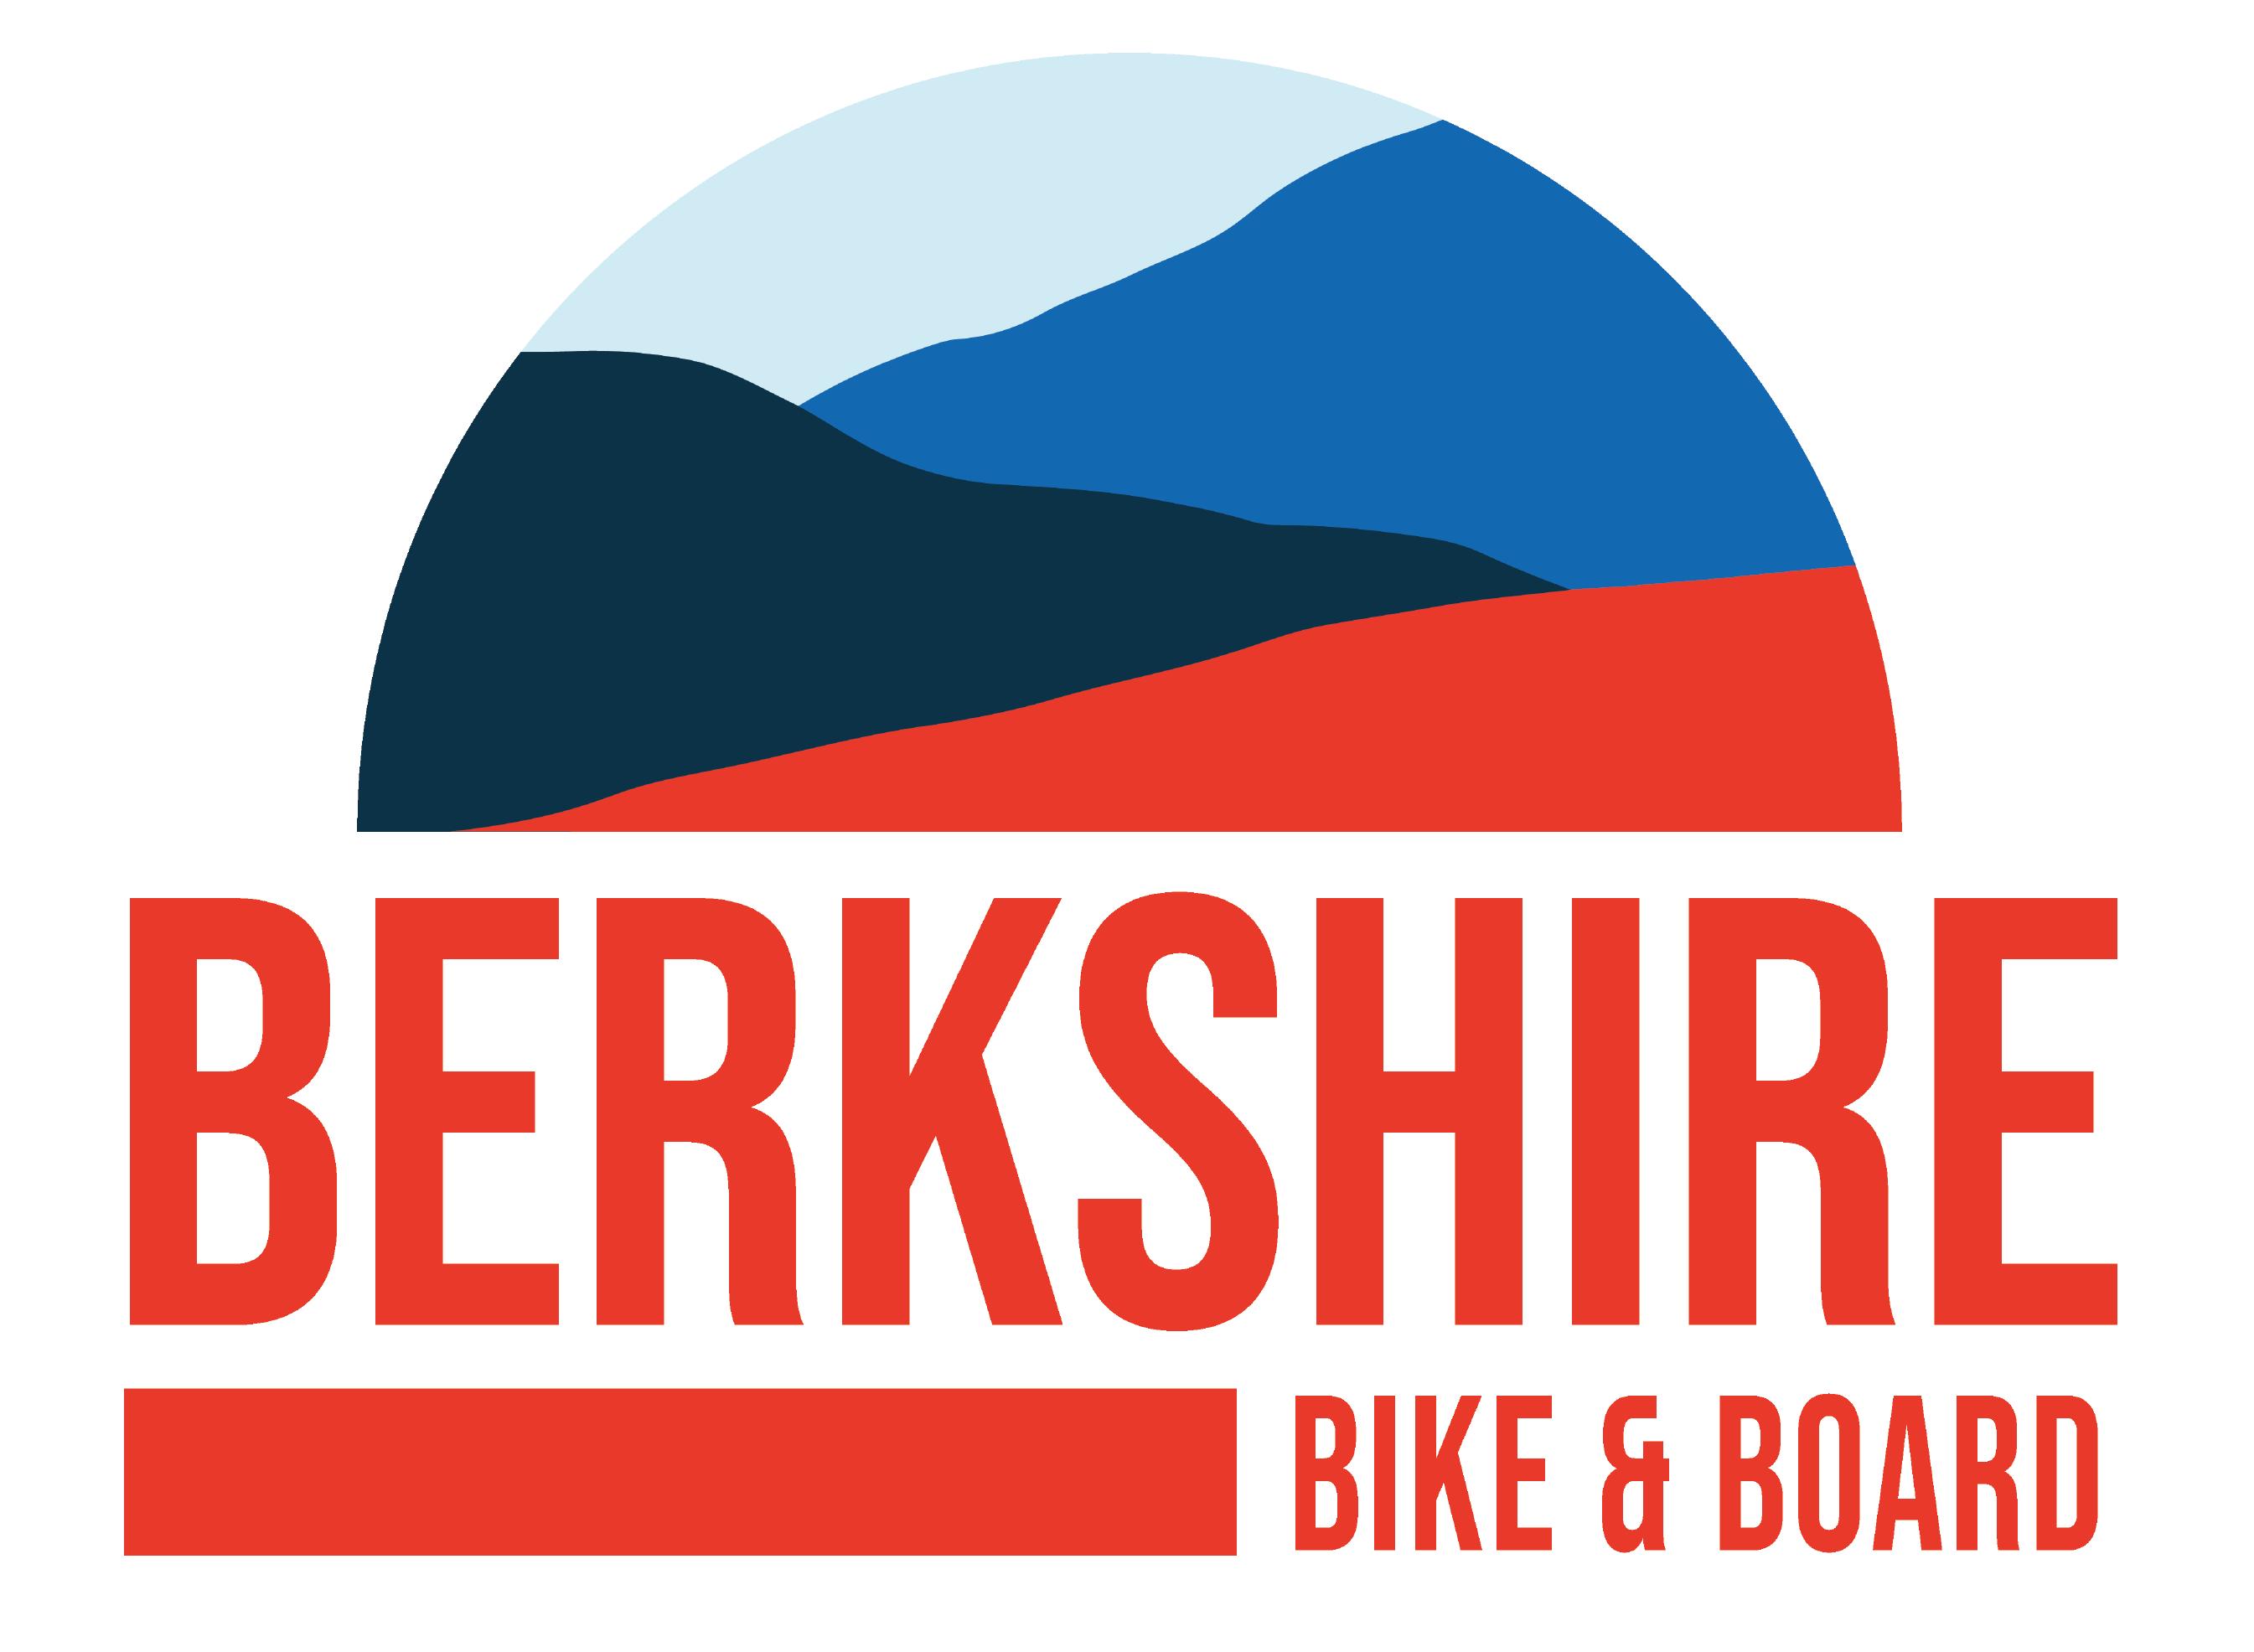 Berkshire Bike & Board - link home page